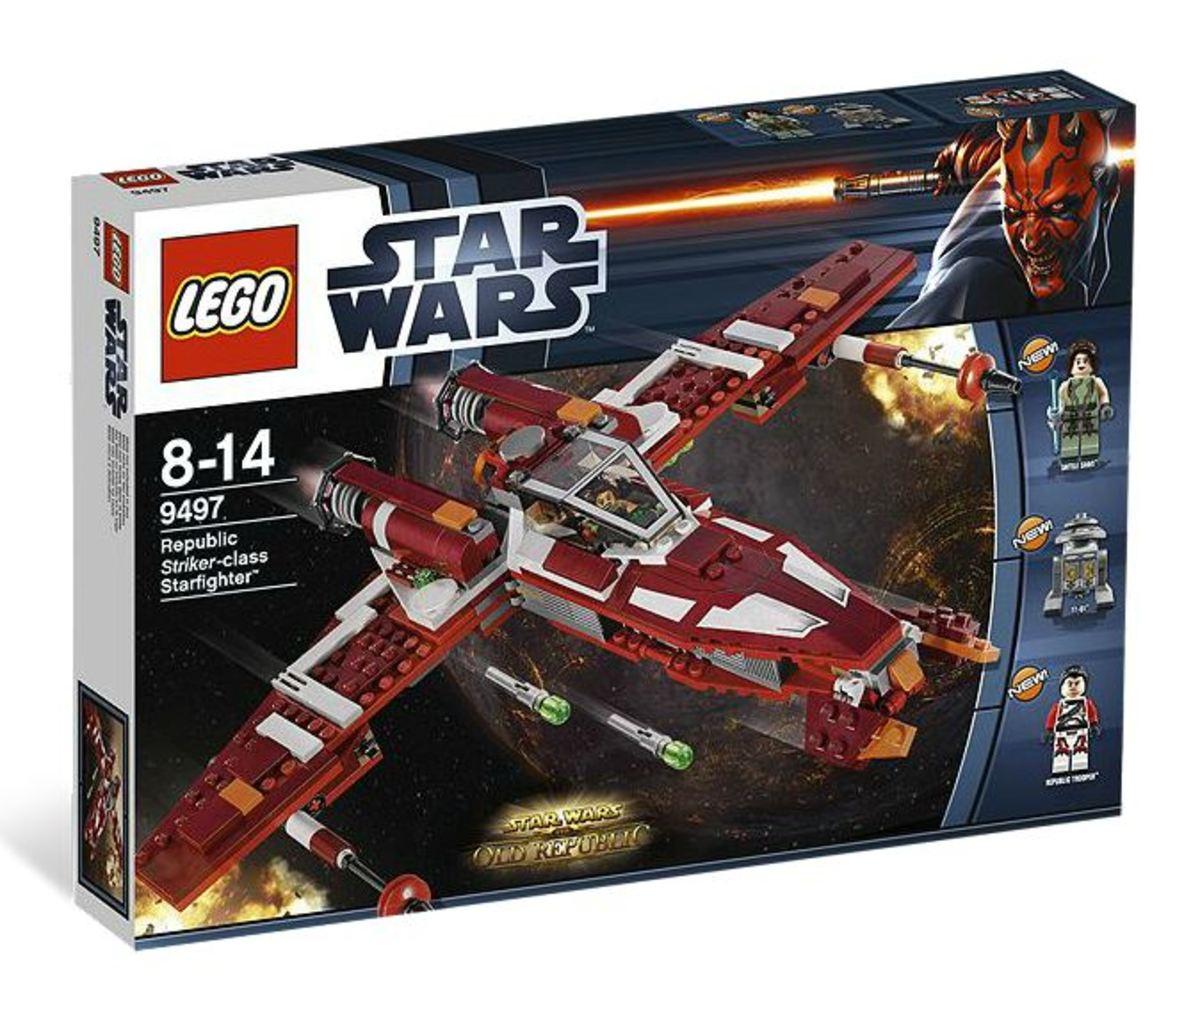 LEGO Star Wars Republic Striker Starfighter 9497 Box